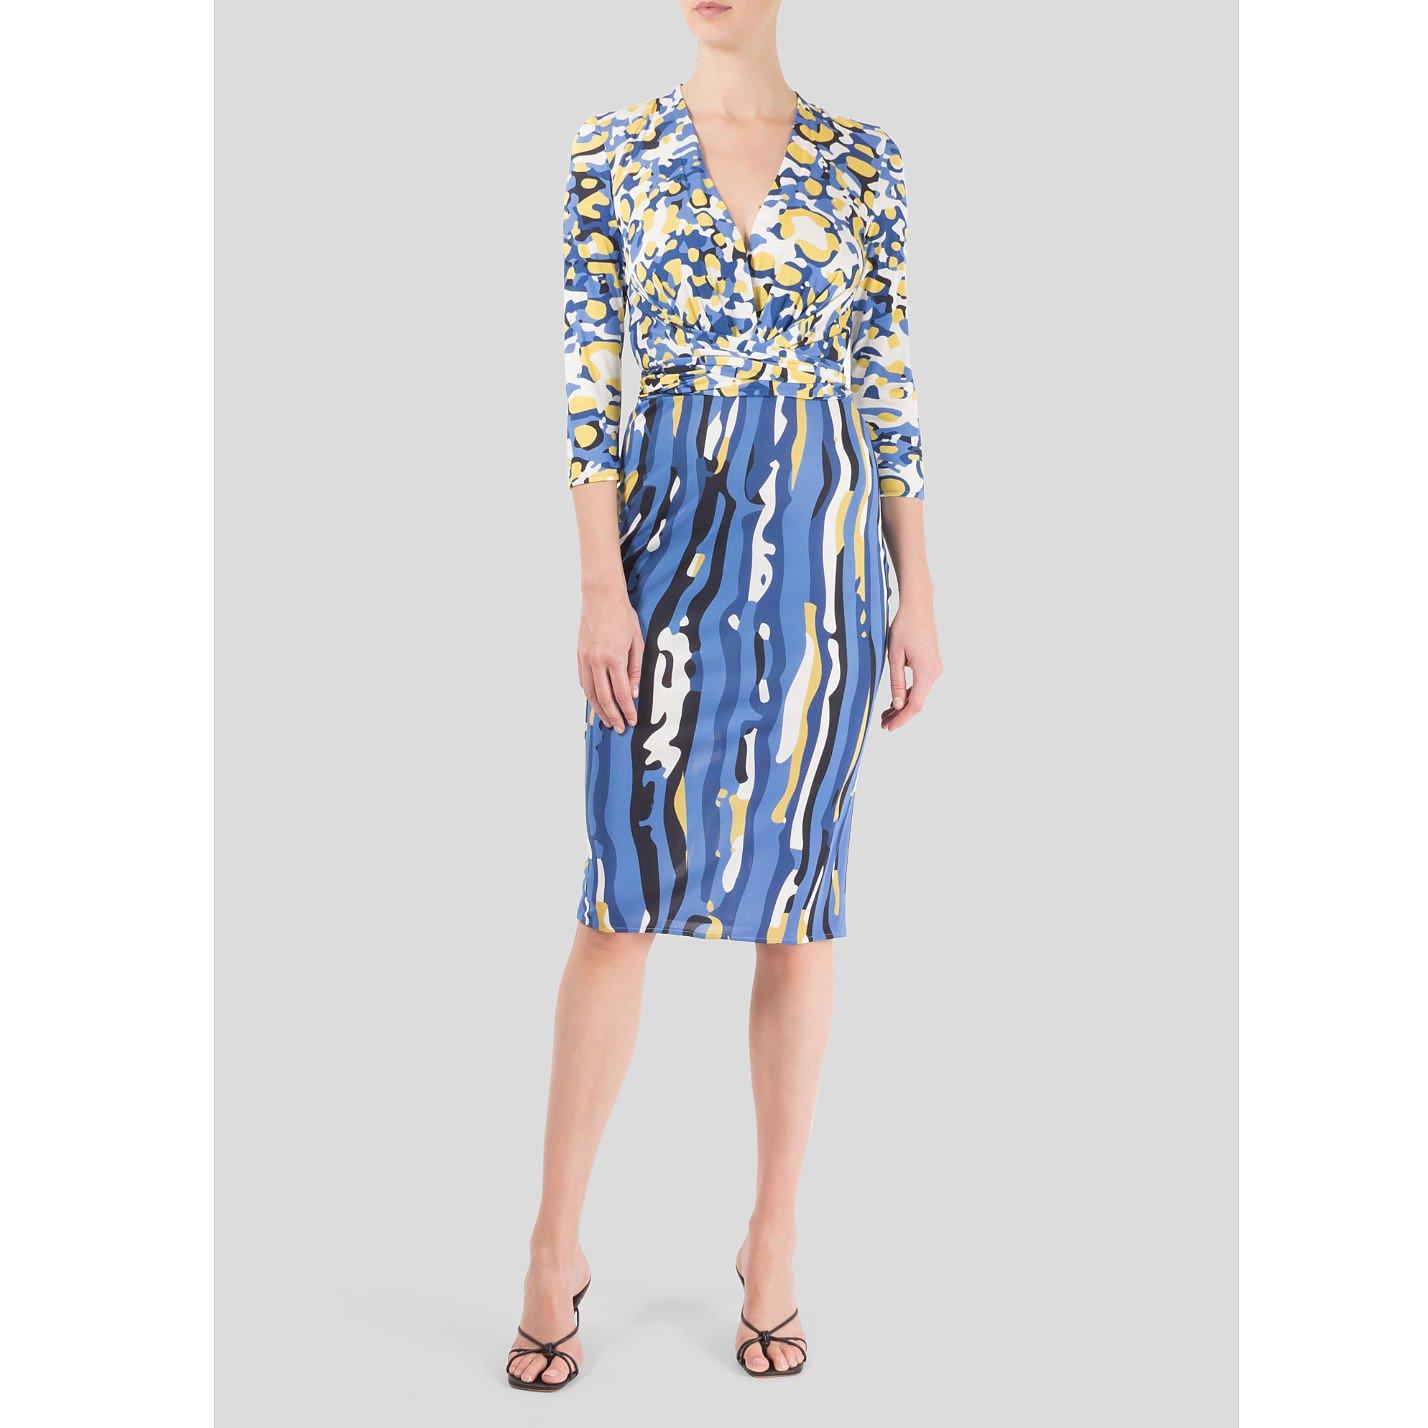 Dhela Patterned Dress